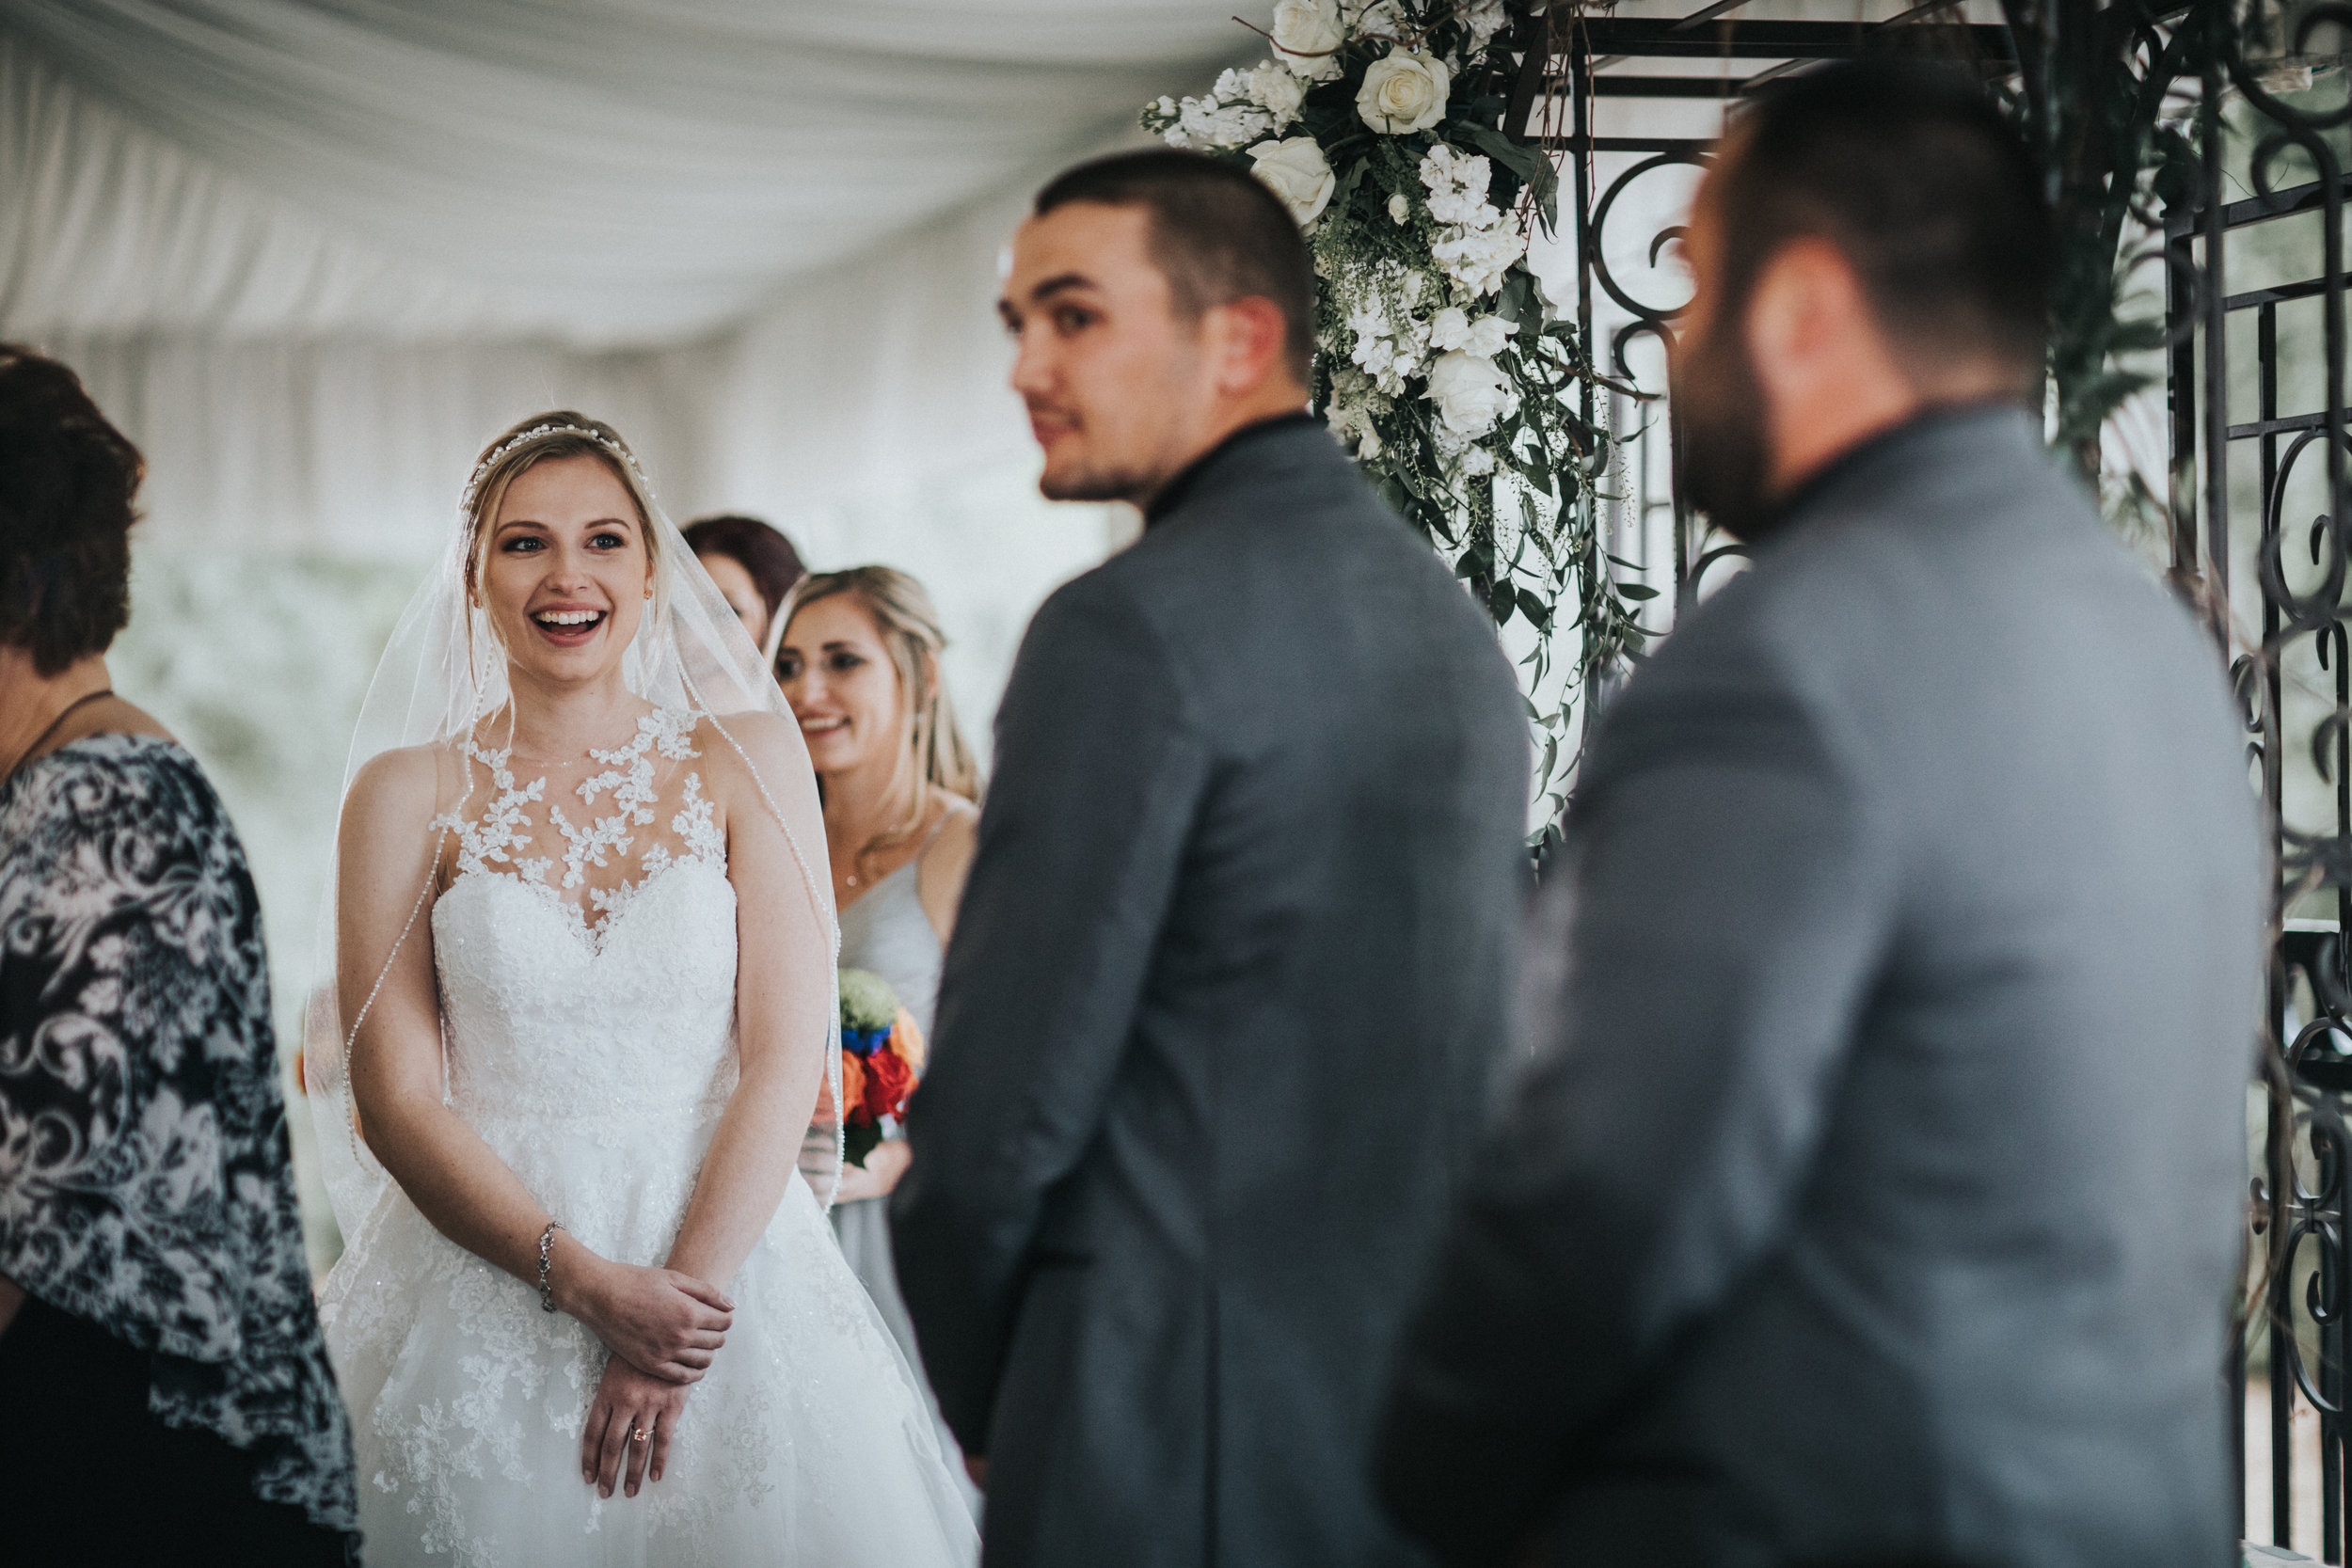 New-Jersey-Wedding-Photographer-Megan&Nick-Ceremony-90.jpg